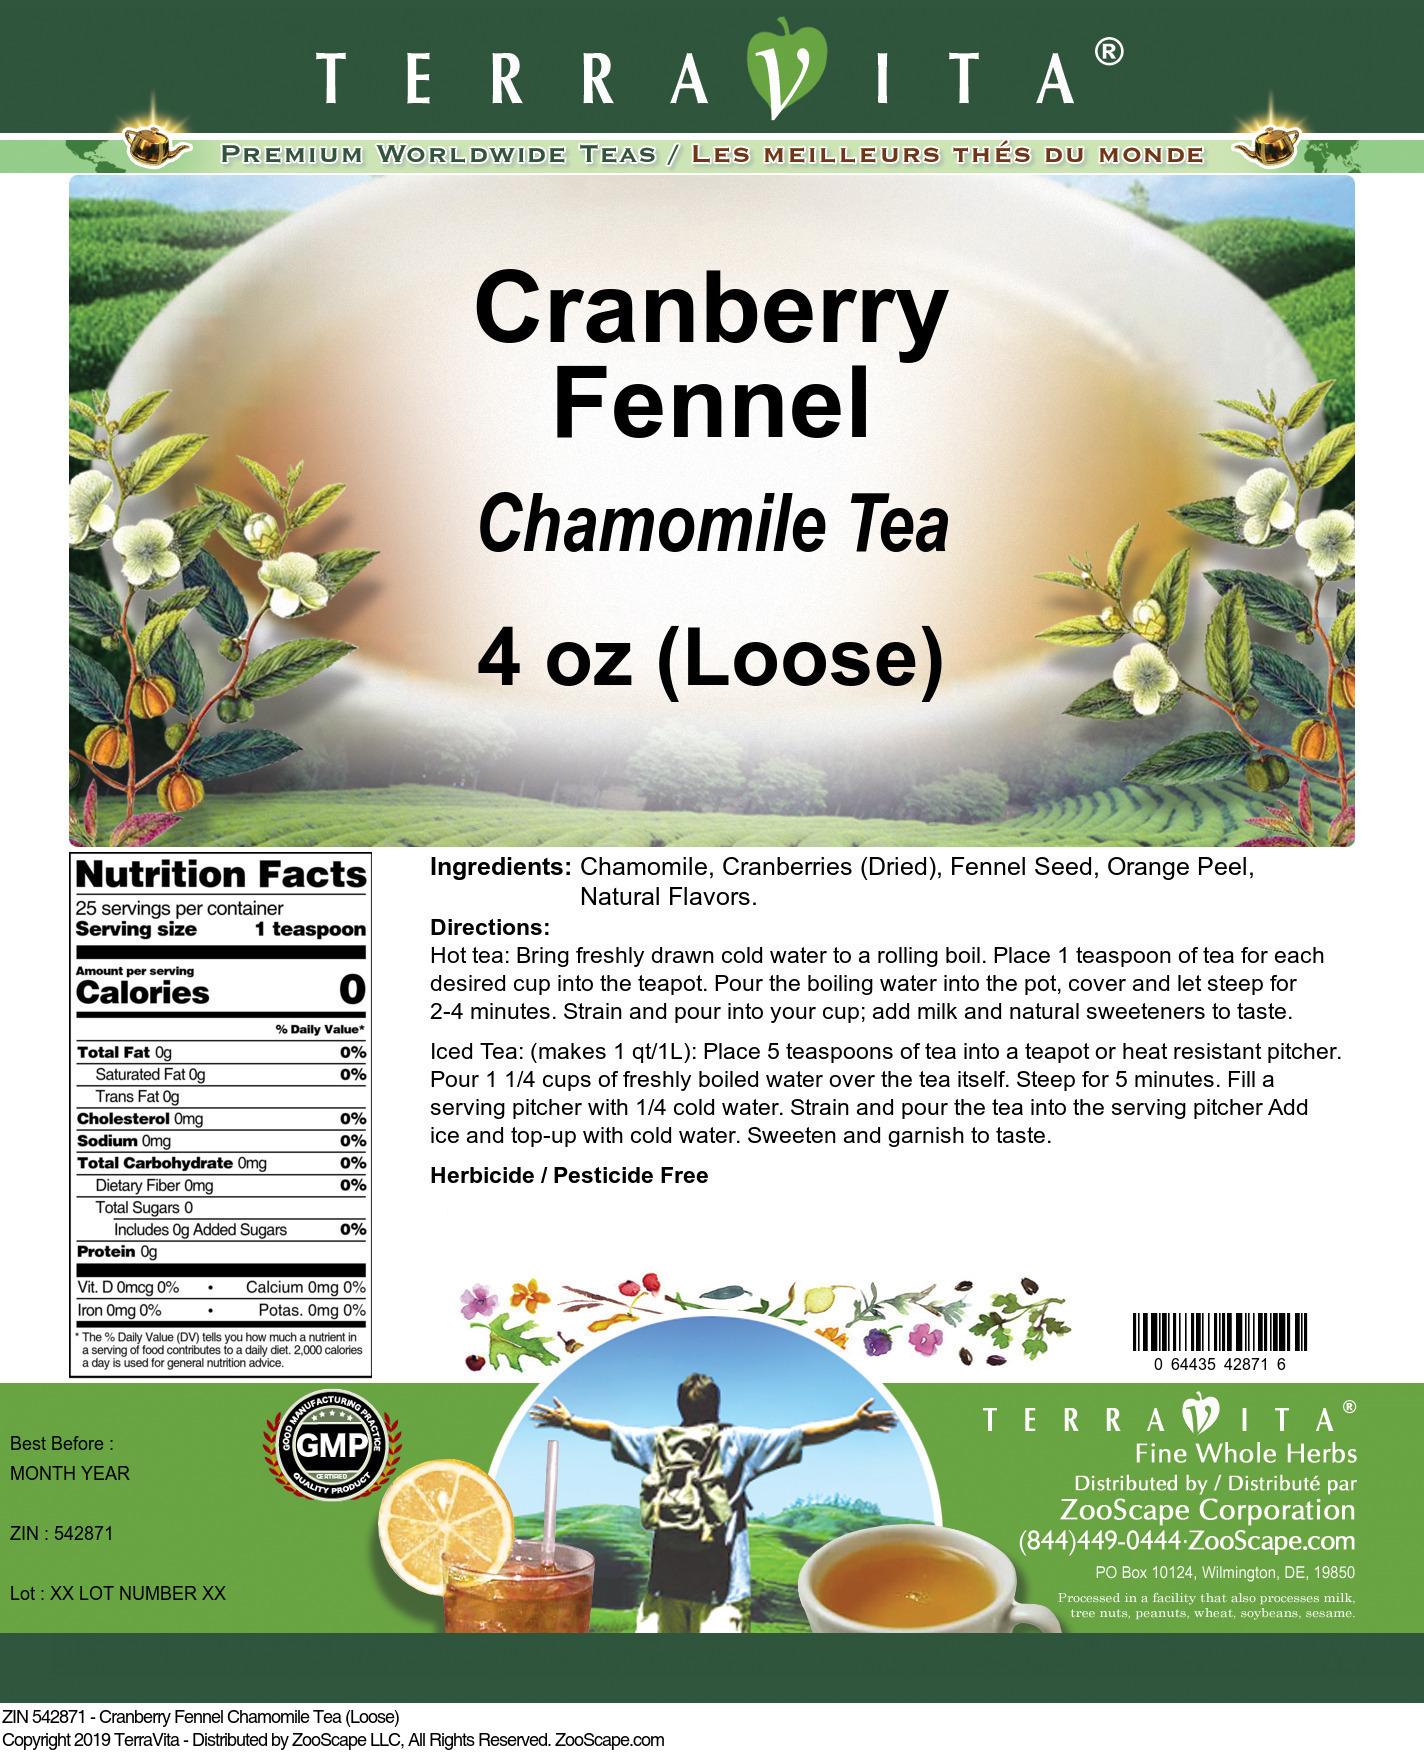 Cranberry Fennel Chamomile Tea